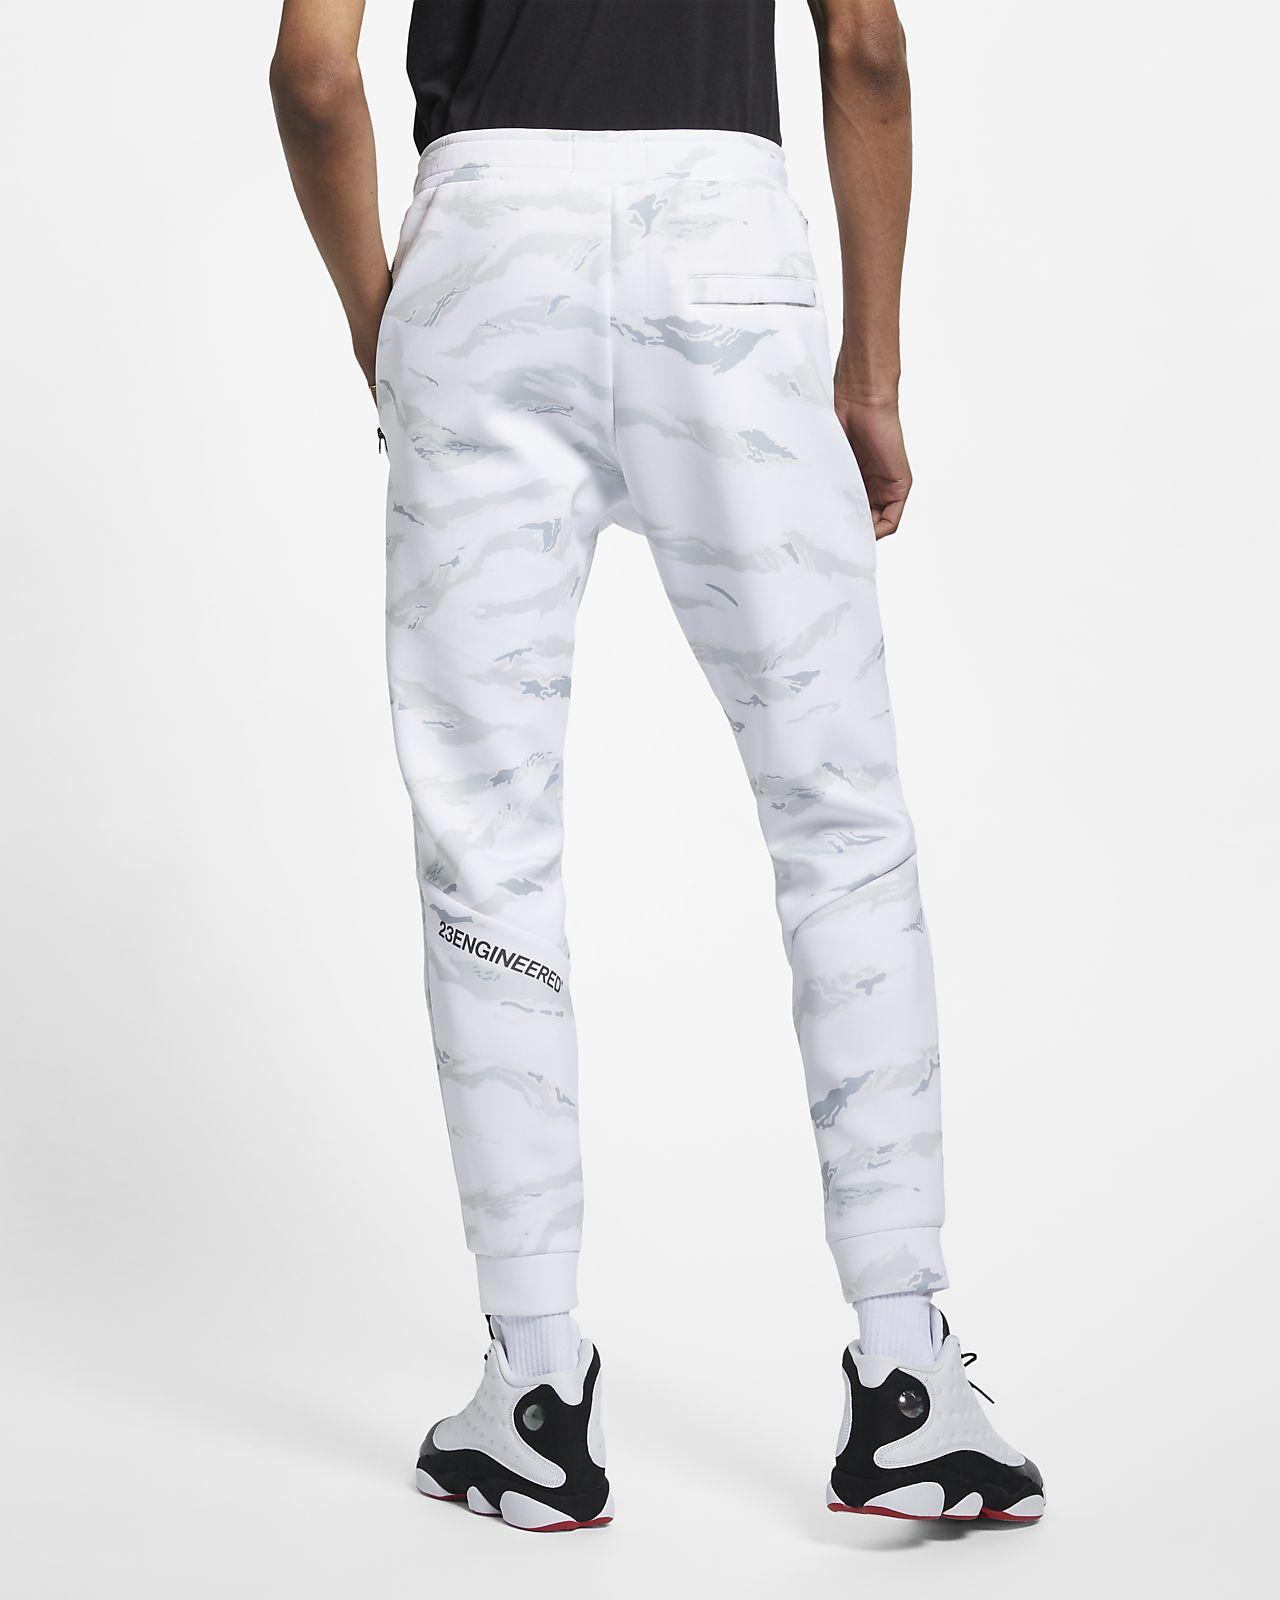 d835f0355da8 Jordan Sportswear Flight Tech Men s Camo Trousers. Nike.com CA